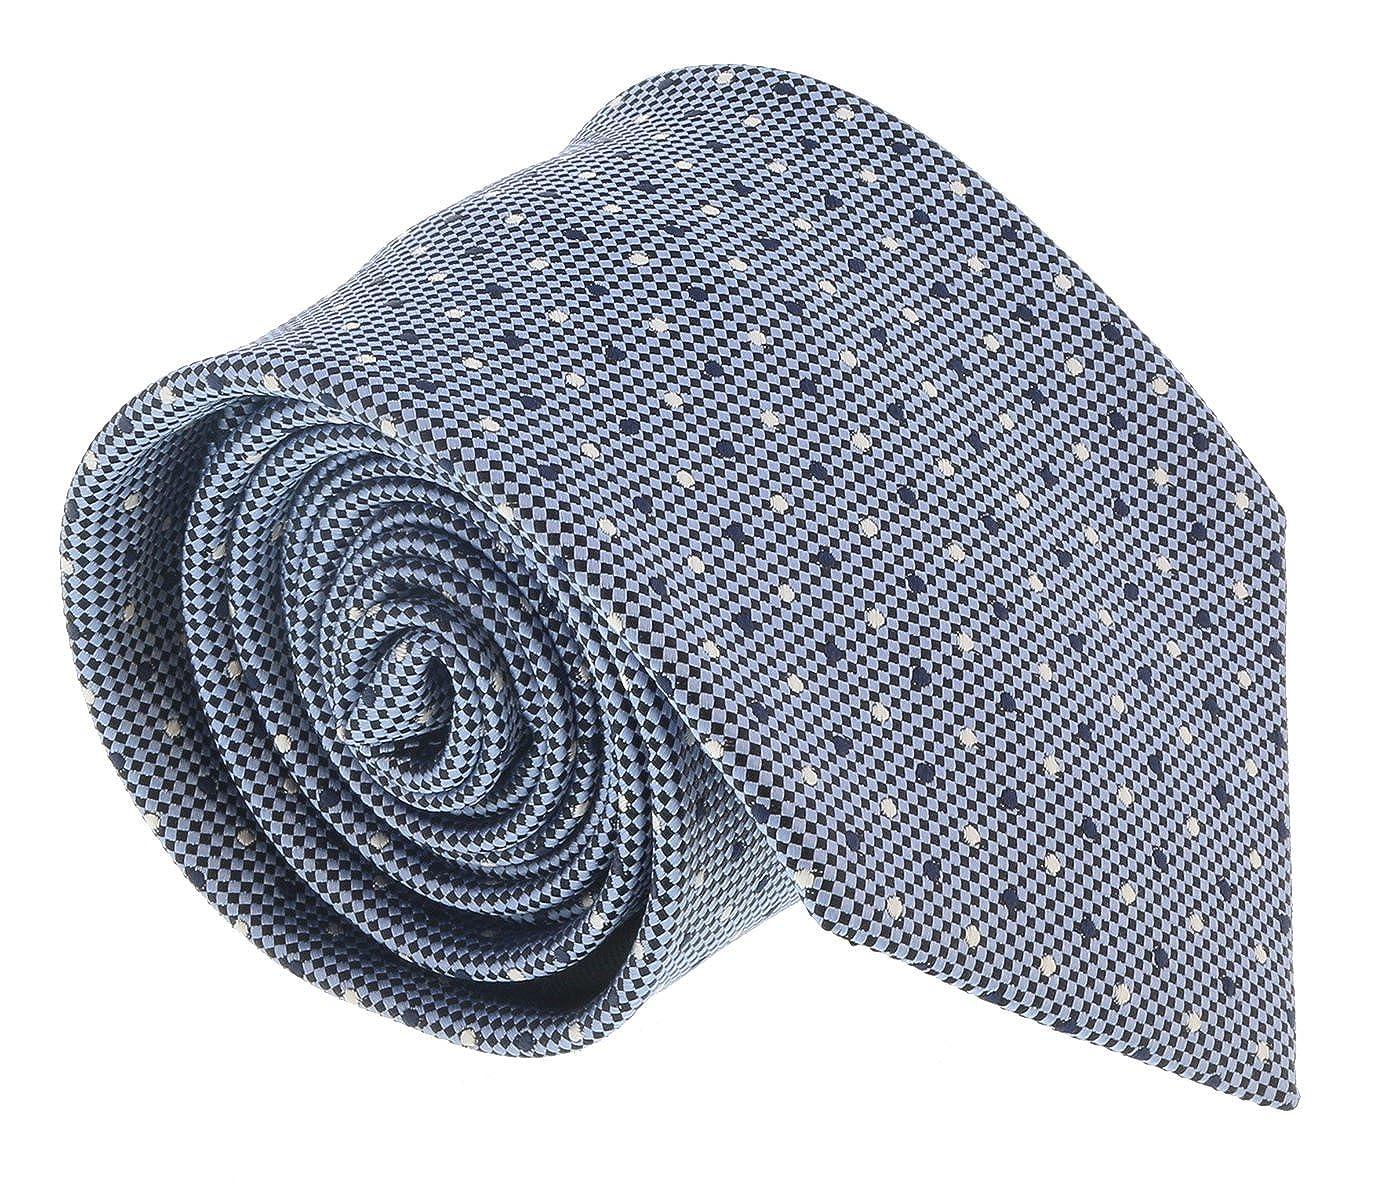 f7b73fce554a3 Ermenegildo Zegna Light Blue Polka Dot Tie for mens at Amazon Men's  Clothing store: